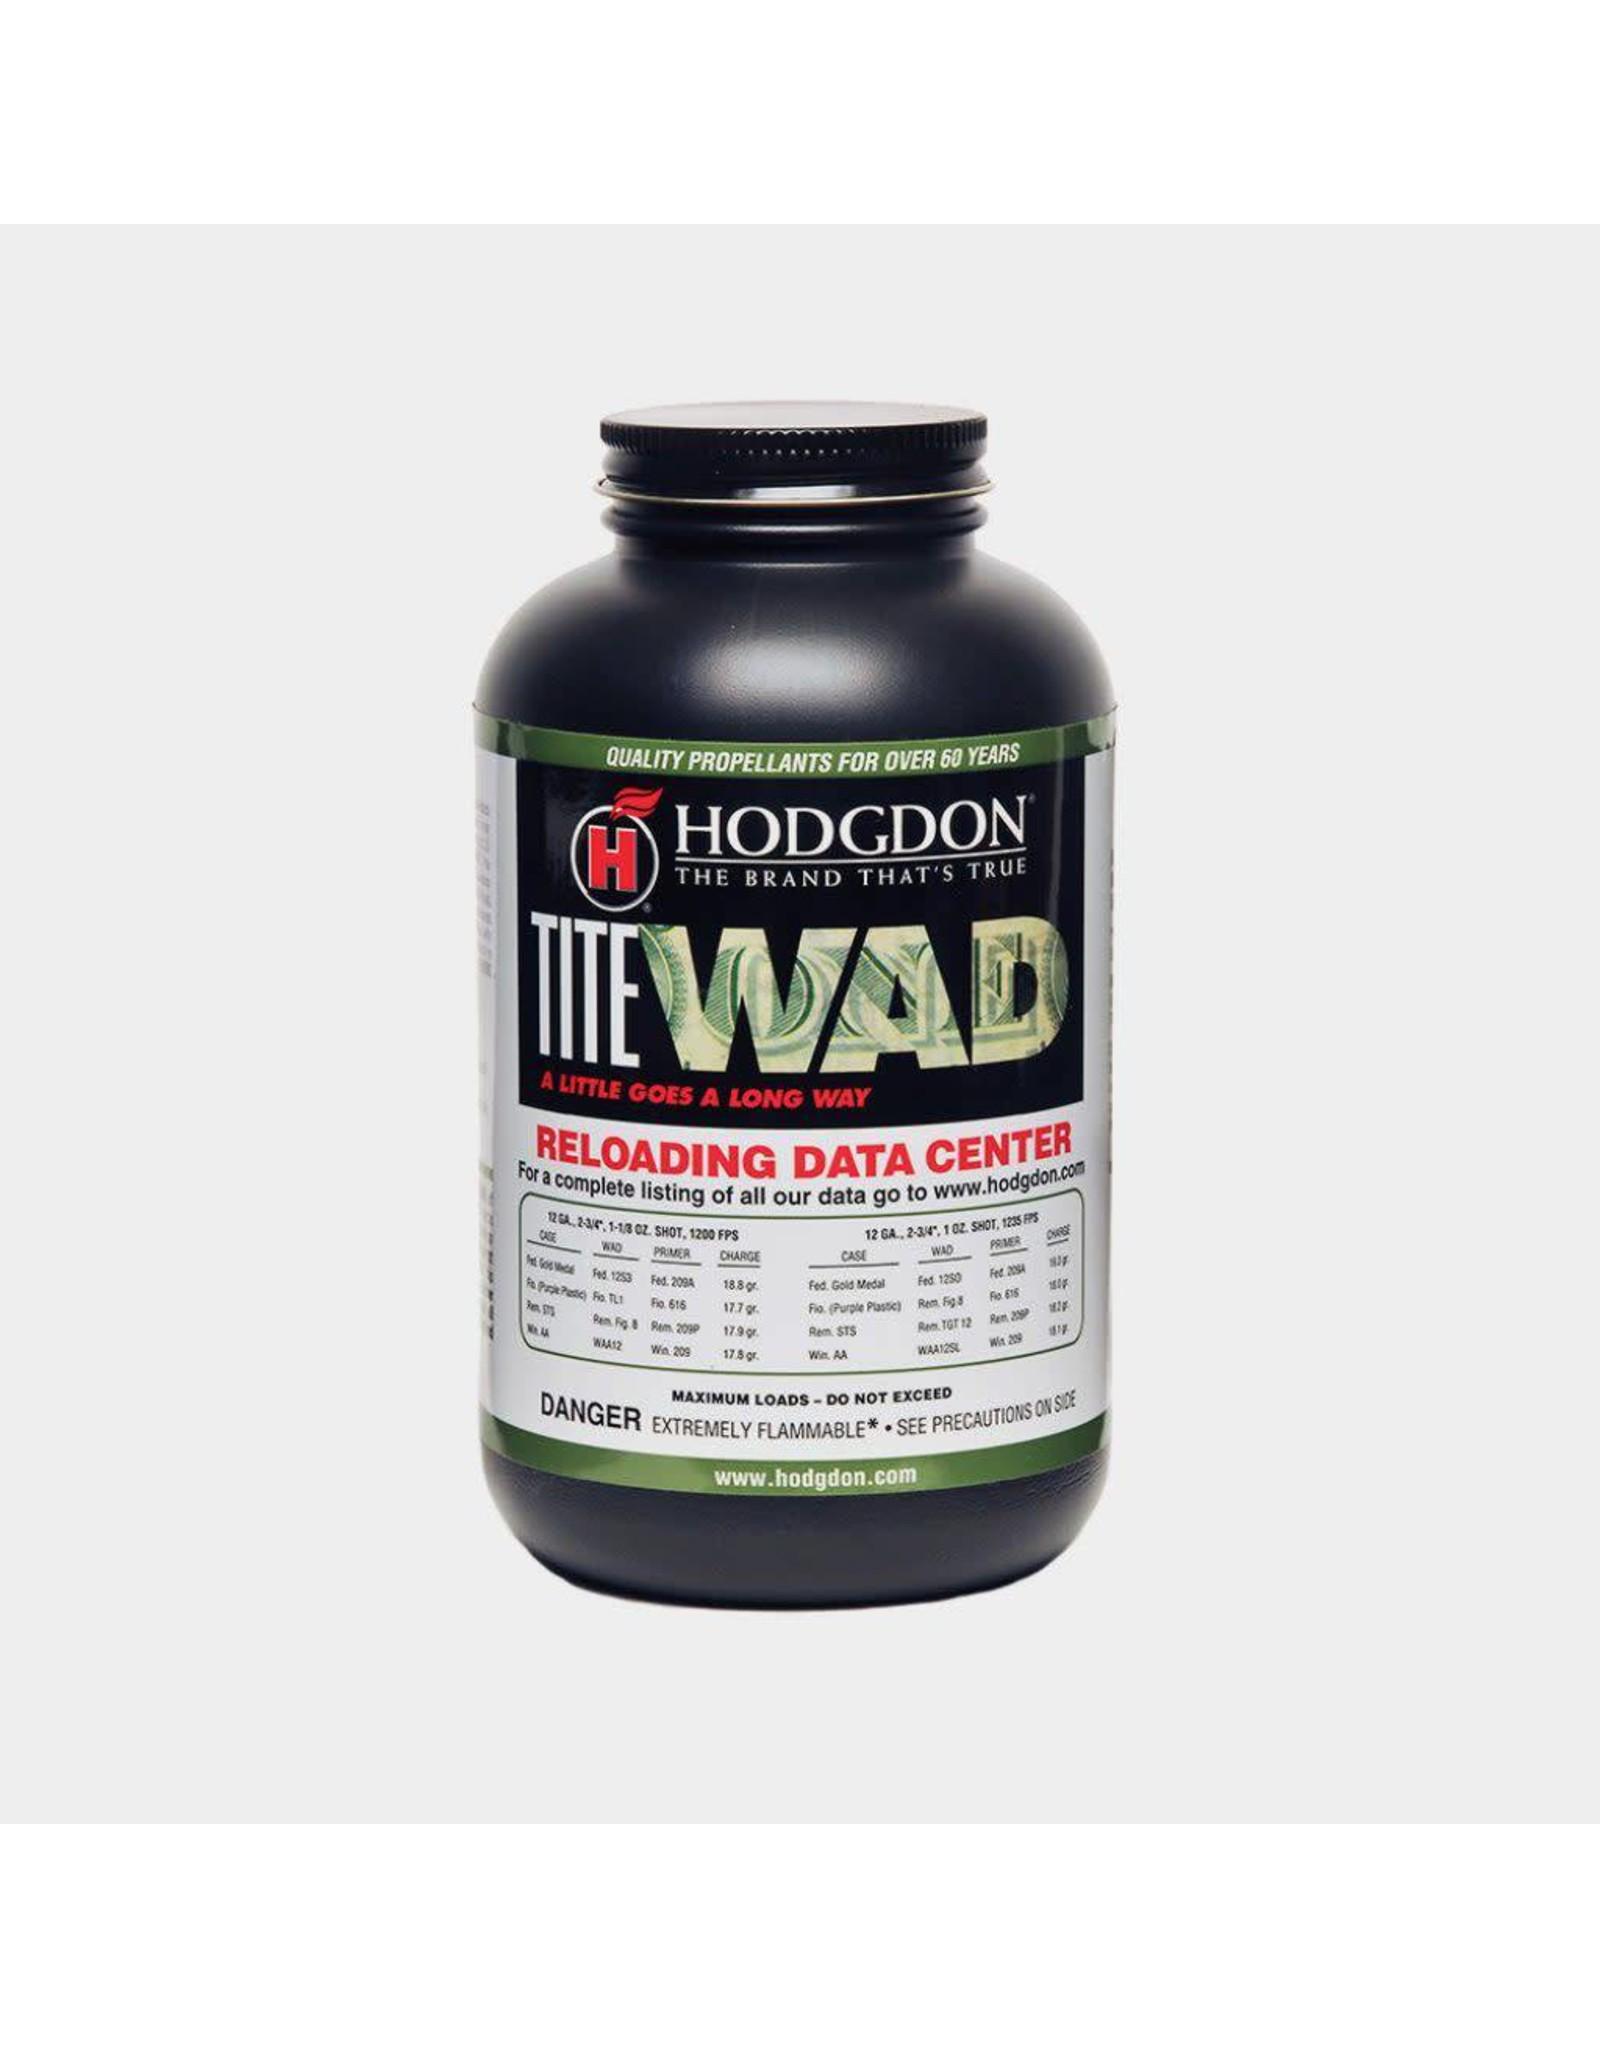 Hodgdon Hodgdon Titewad -  14 ounce